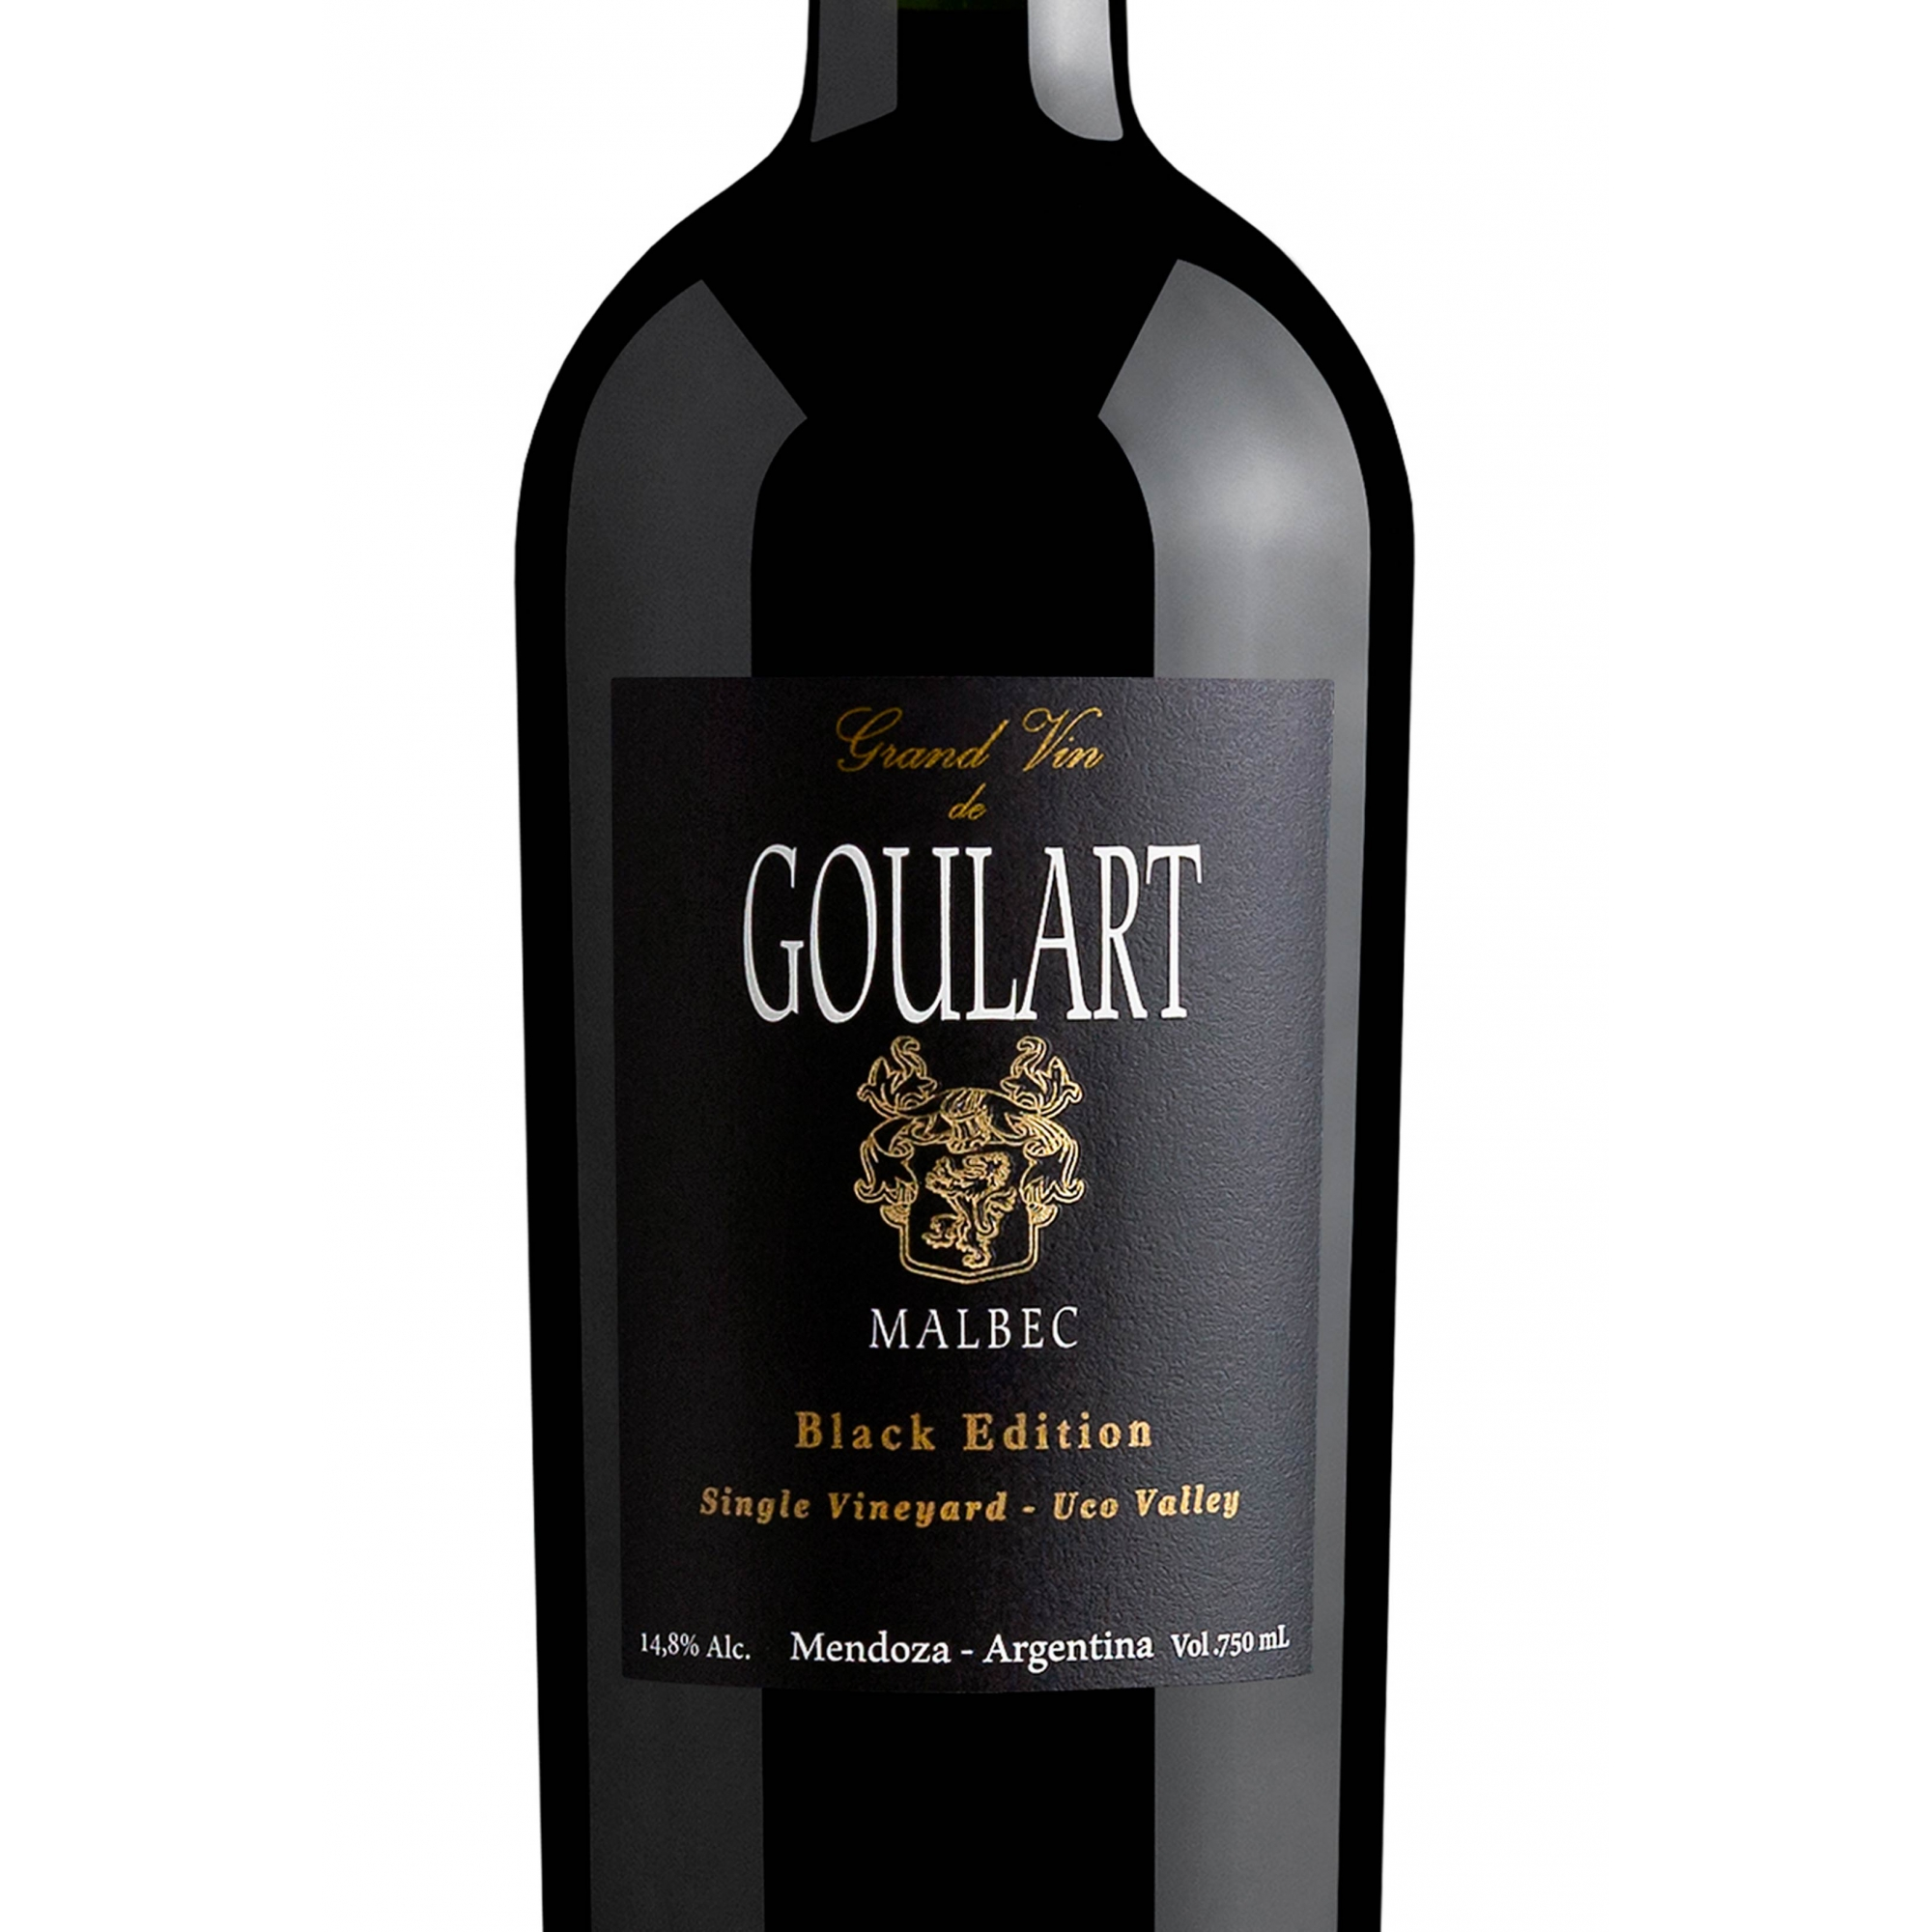 Goulart Grand Vin - Malbec Black Edition Single Vineyard 2015 - 750ML